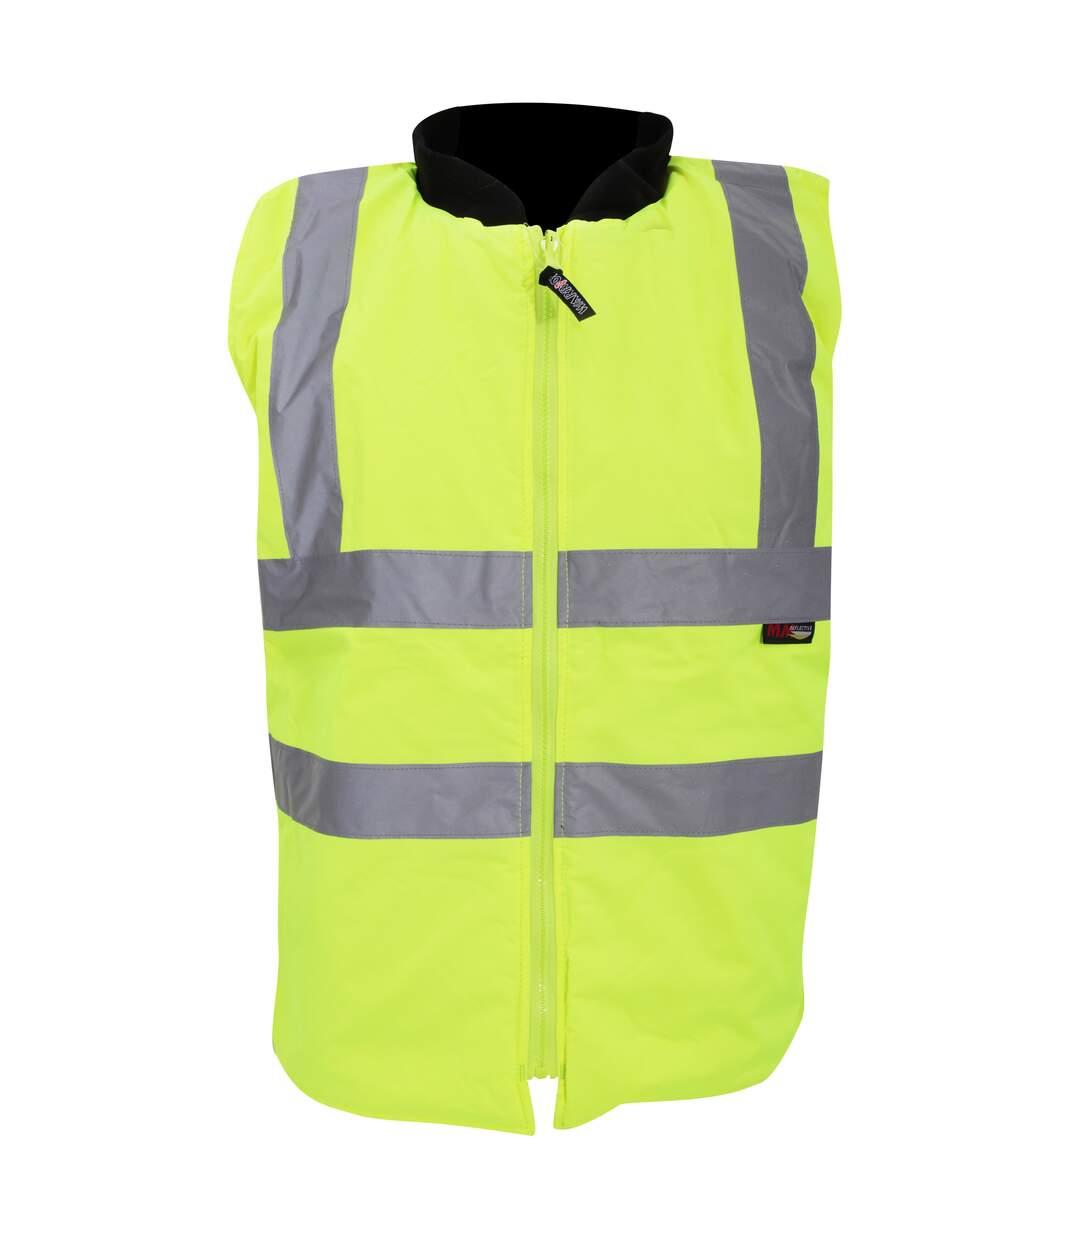 Warrior Mens Phoenix High Visibility Safety Bodywarmer Jacket (Fluorescent Yellow) - UTPC271